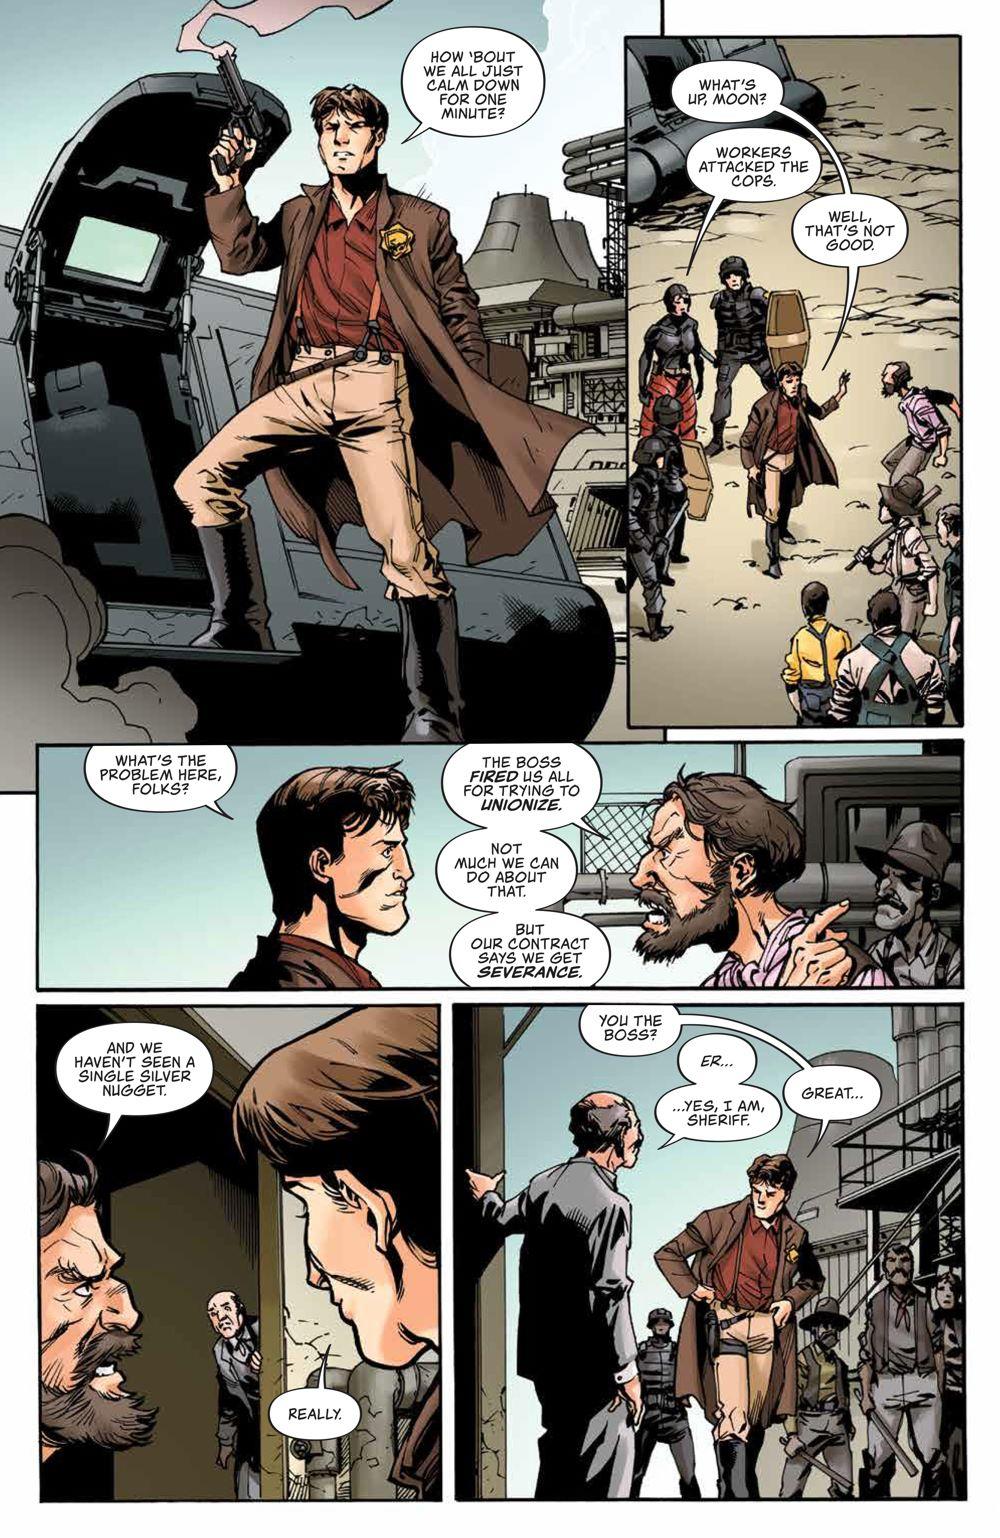 Firefly_NewSheriffVerse_v2_HC_PRESS_17 ComicList Previews: FIREFLY NEW SHERIFF IN THE 'VERSE VOLUME 2 HC